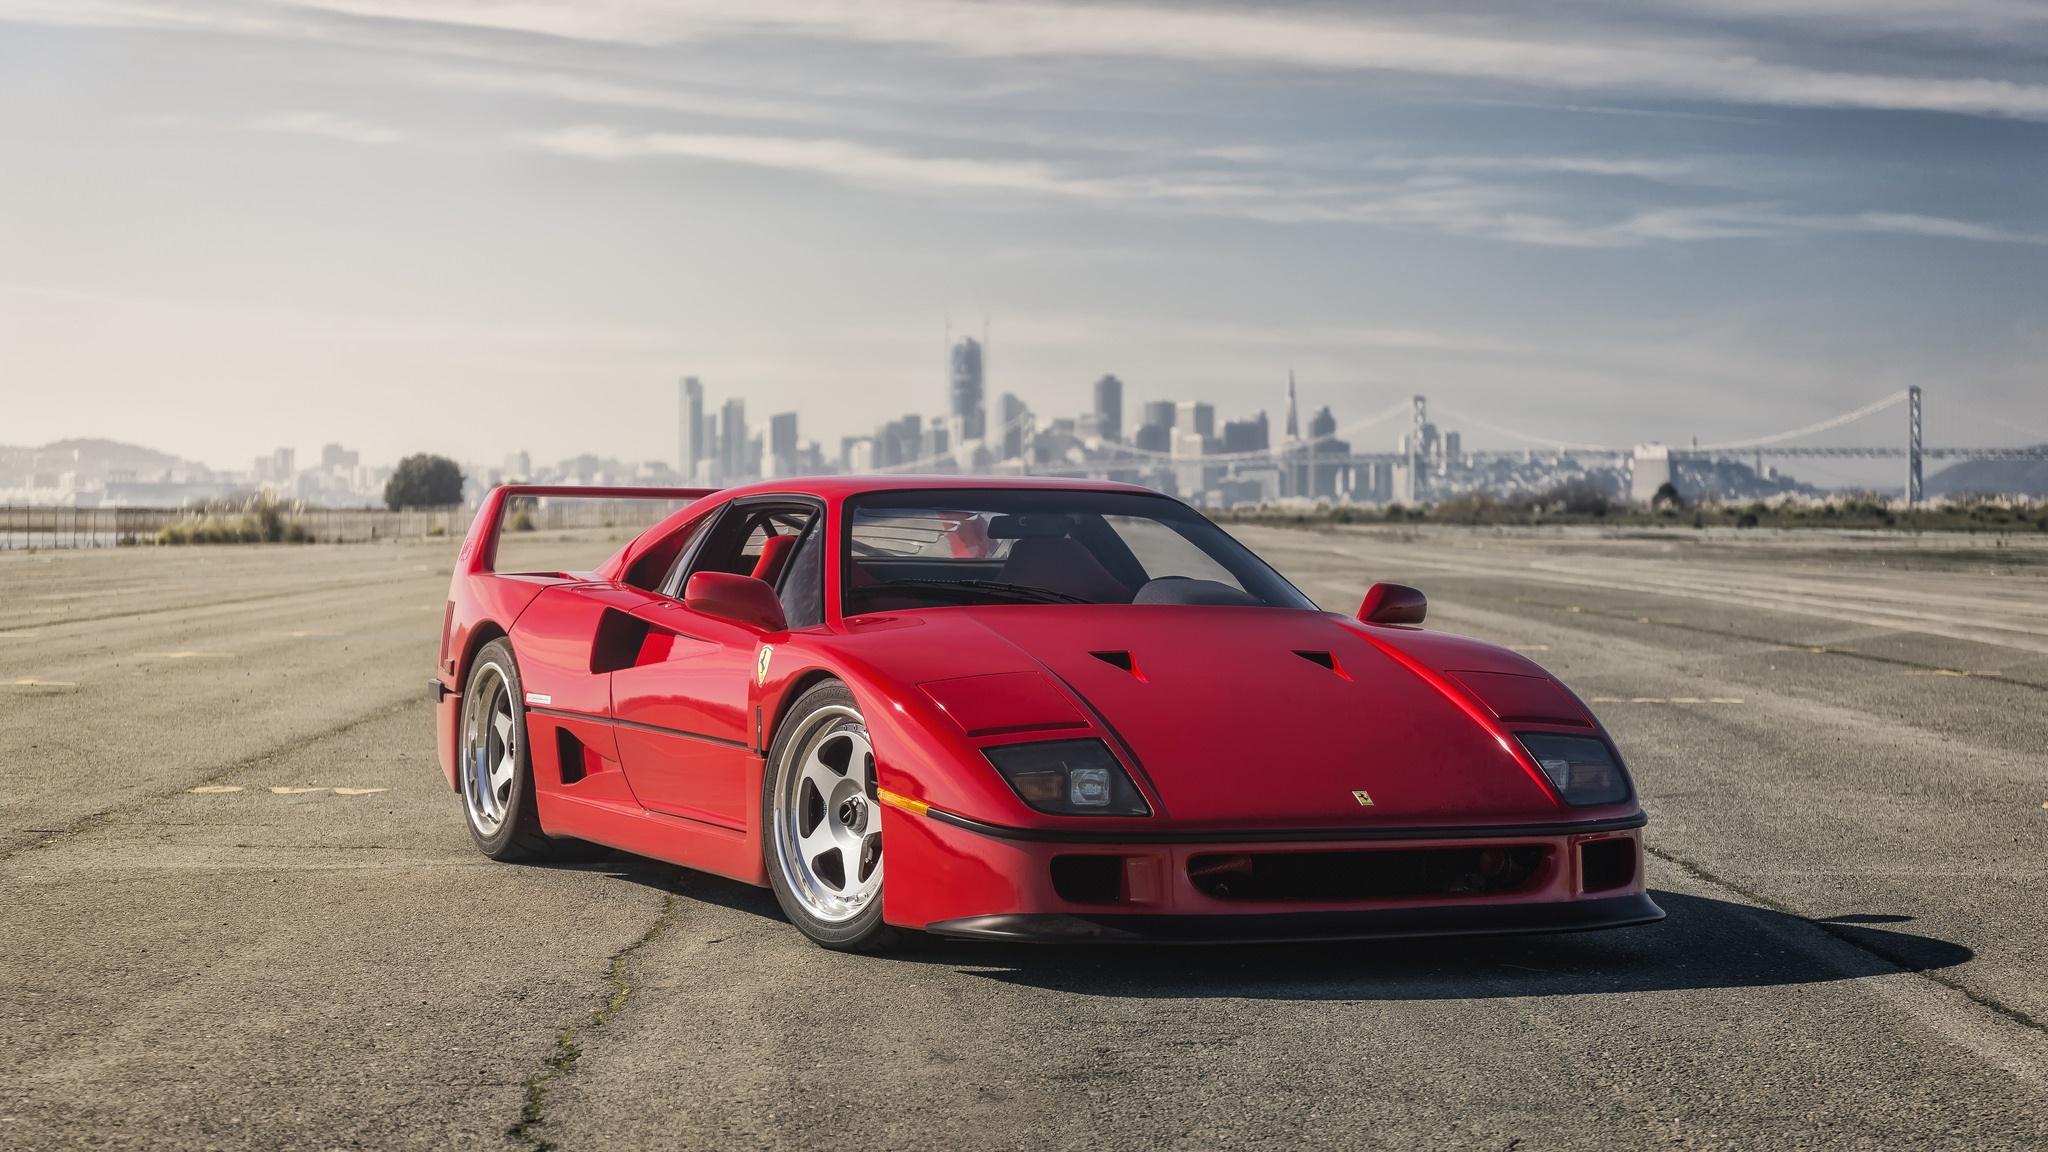 Car Ferrari Ferrari F40 Red Car Sport Car Supercar Vehicle 2048x1152